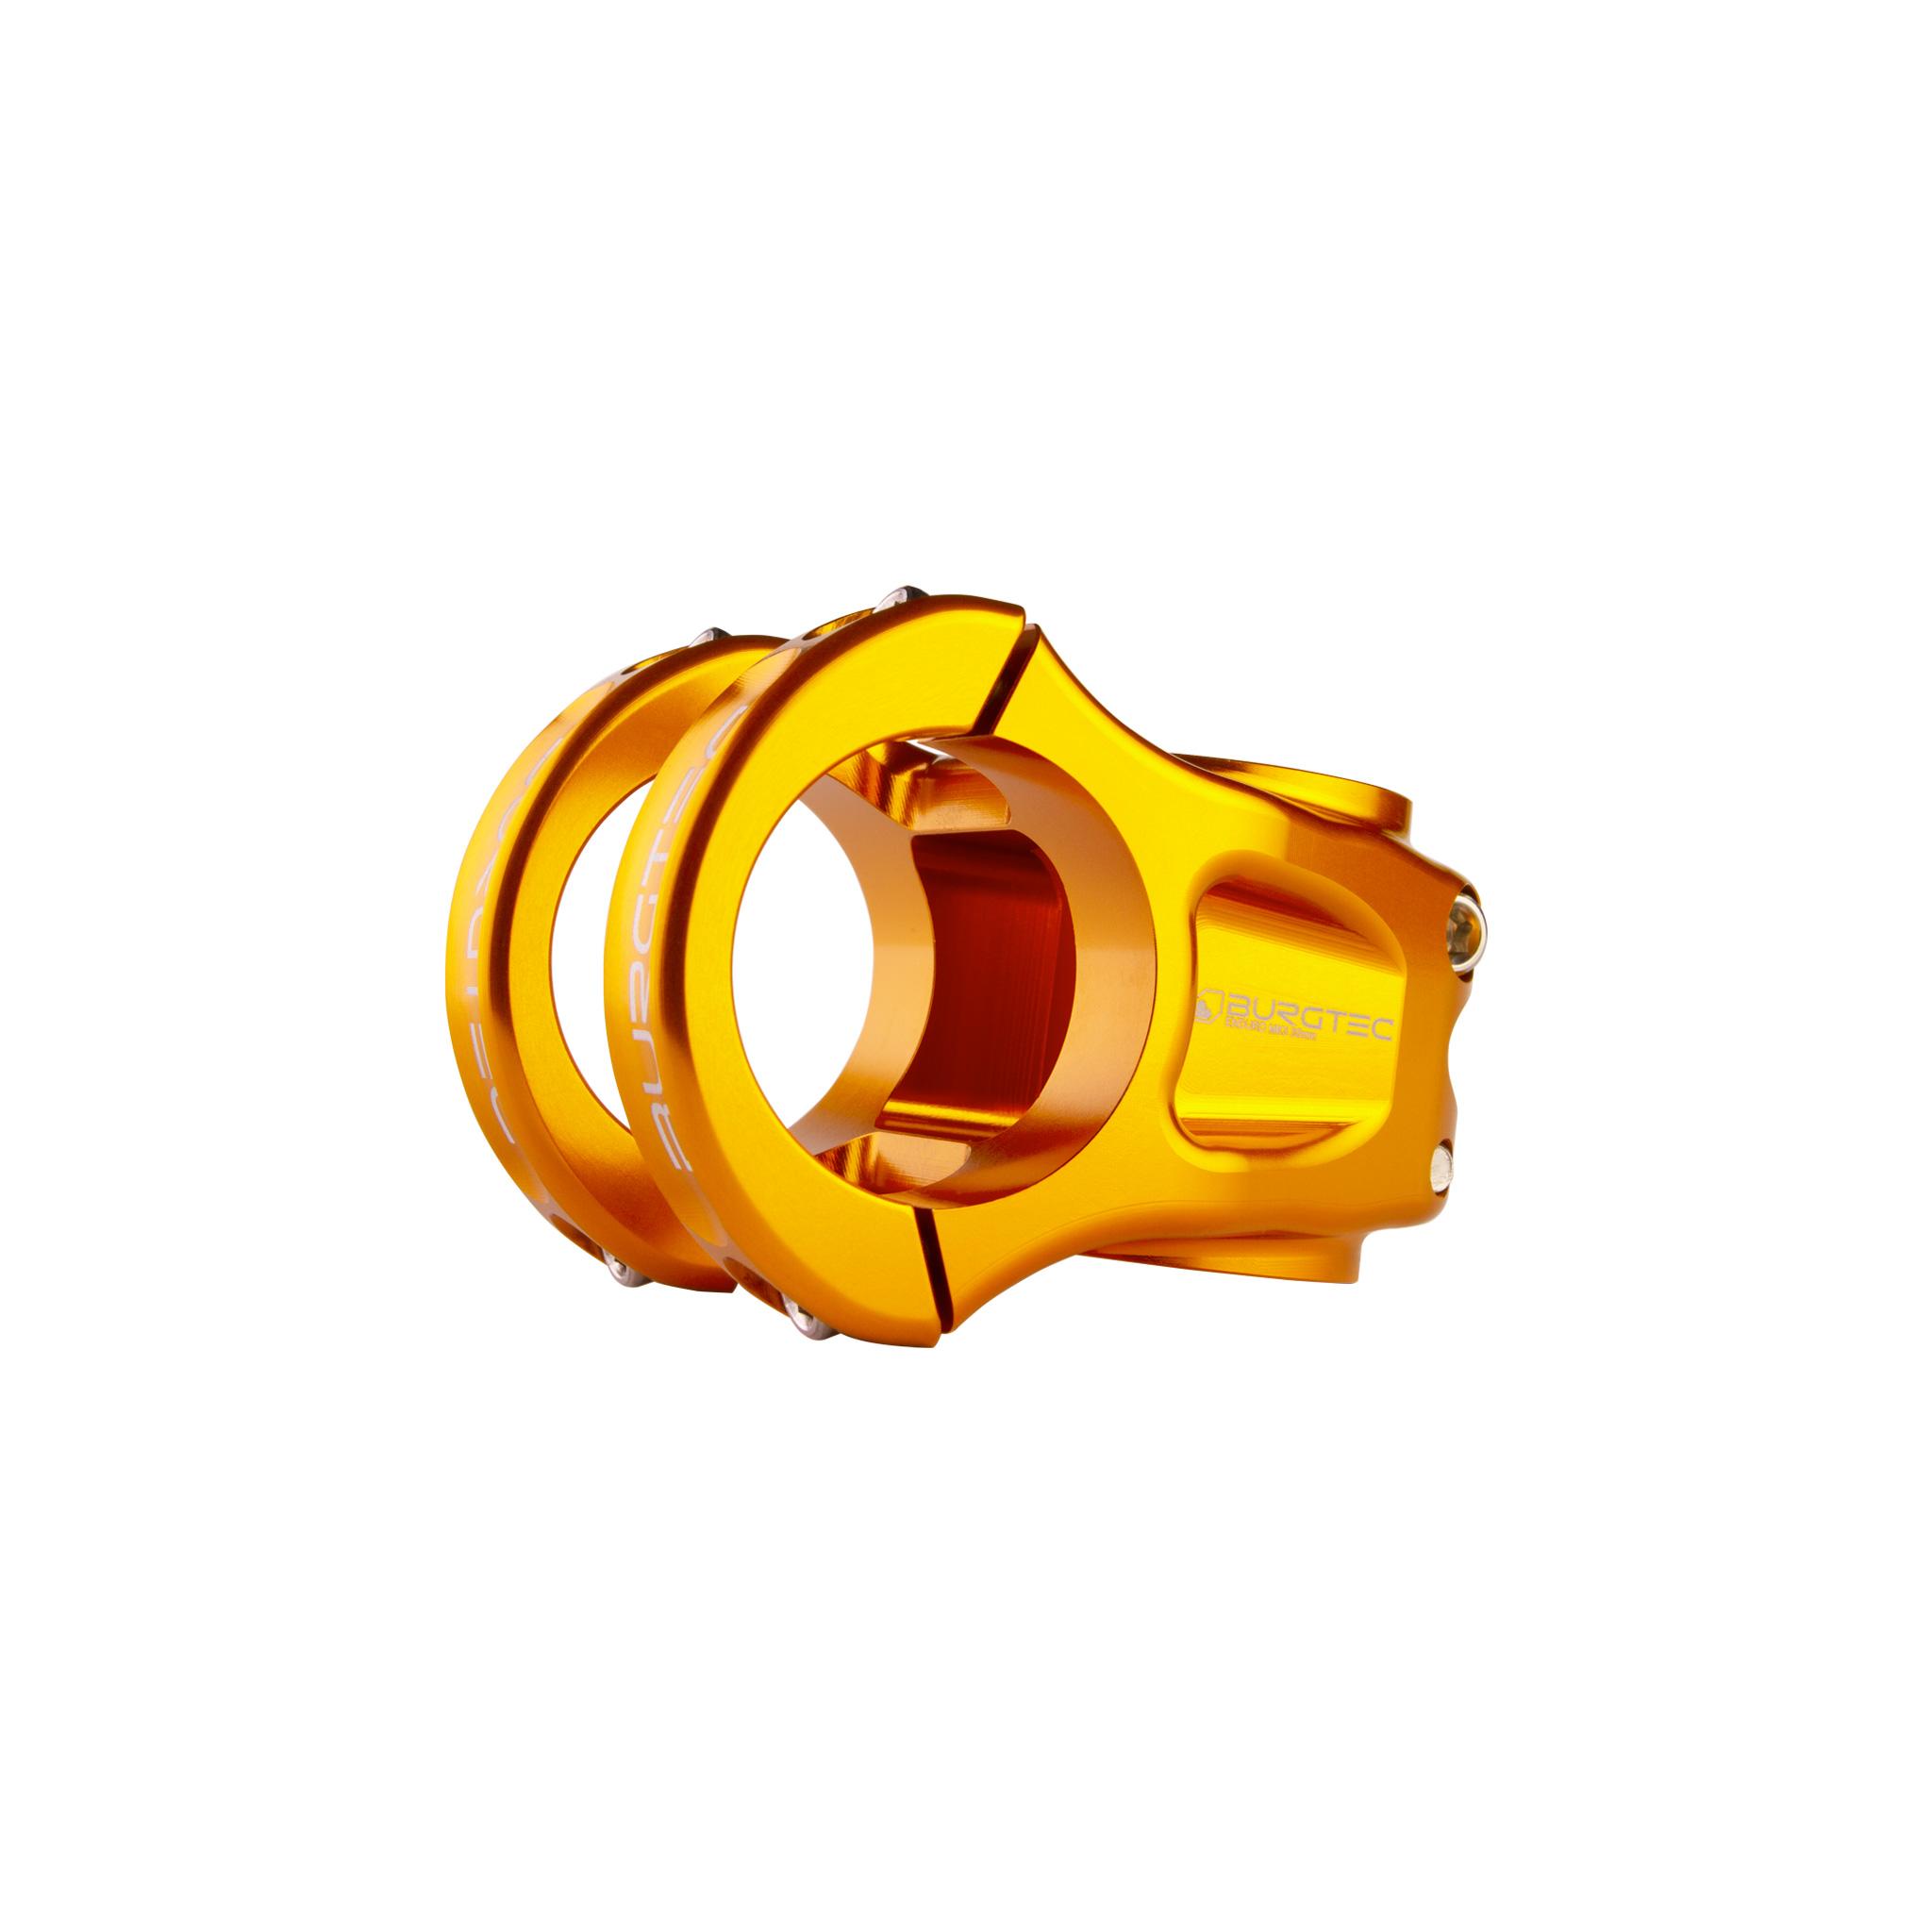 Burgtec Enduro MK3 35 mm Tige-Rouge